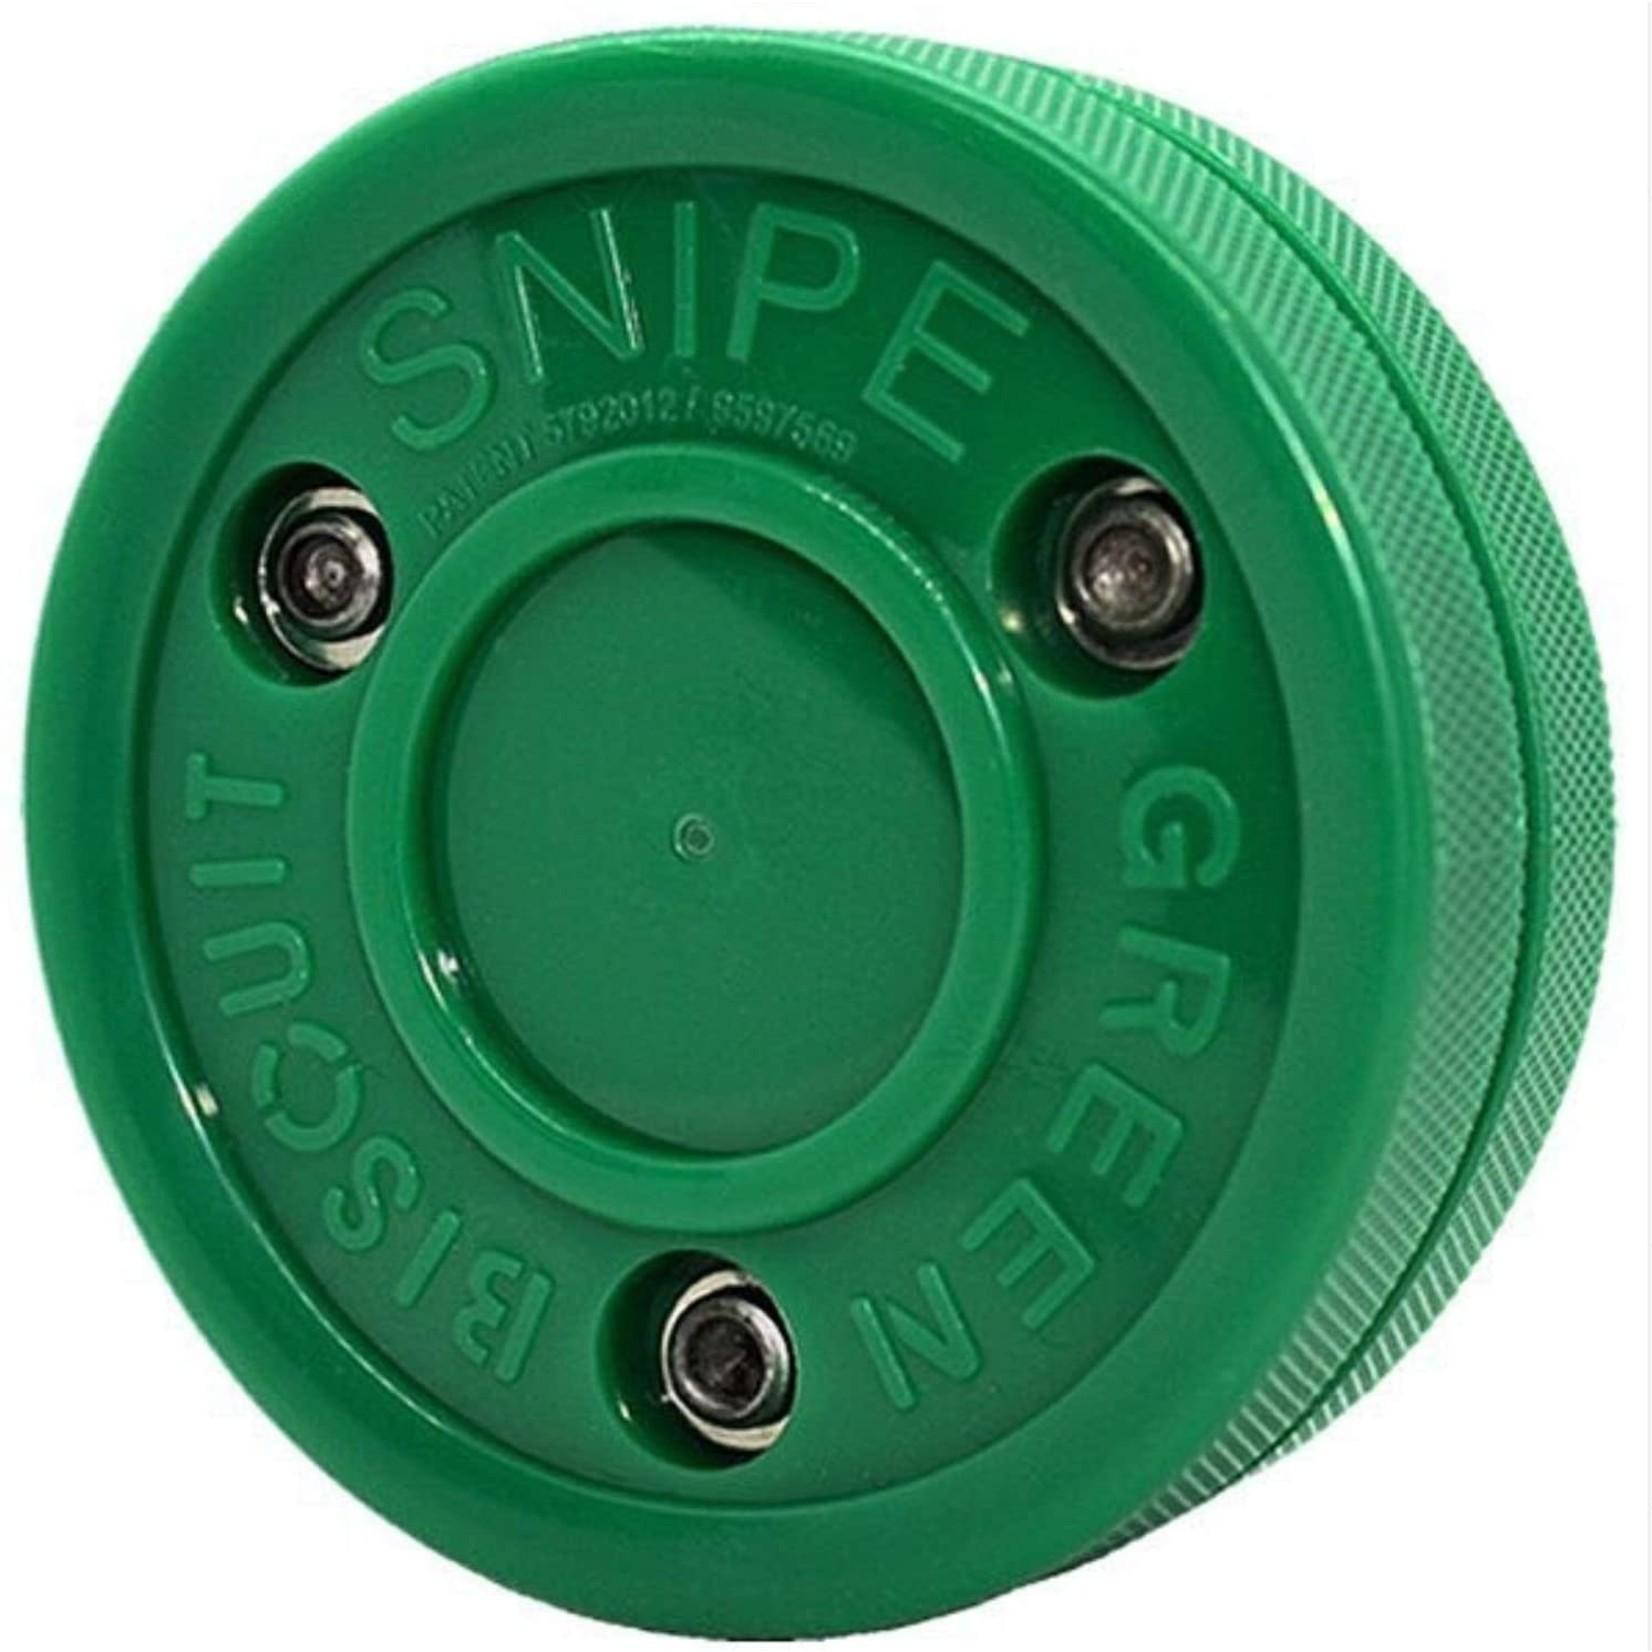 Green Biscuit Hockey Training Puck, Snipe